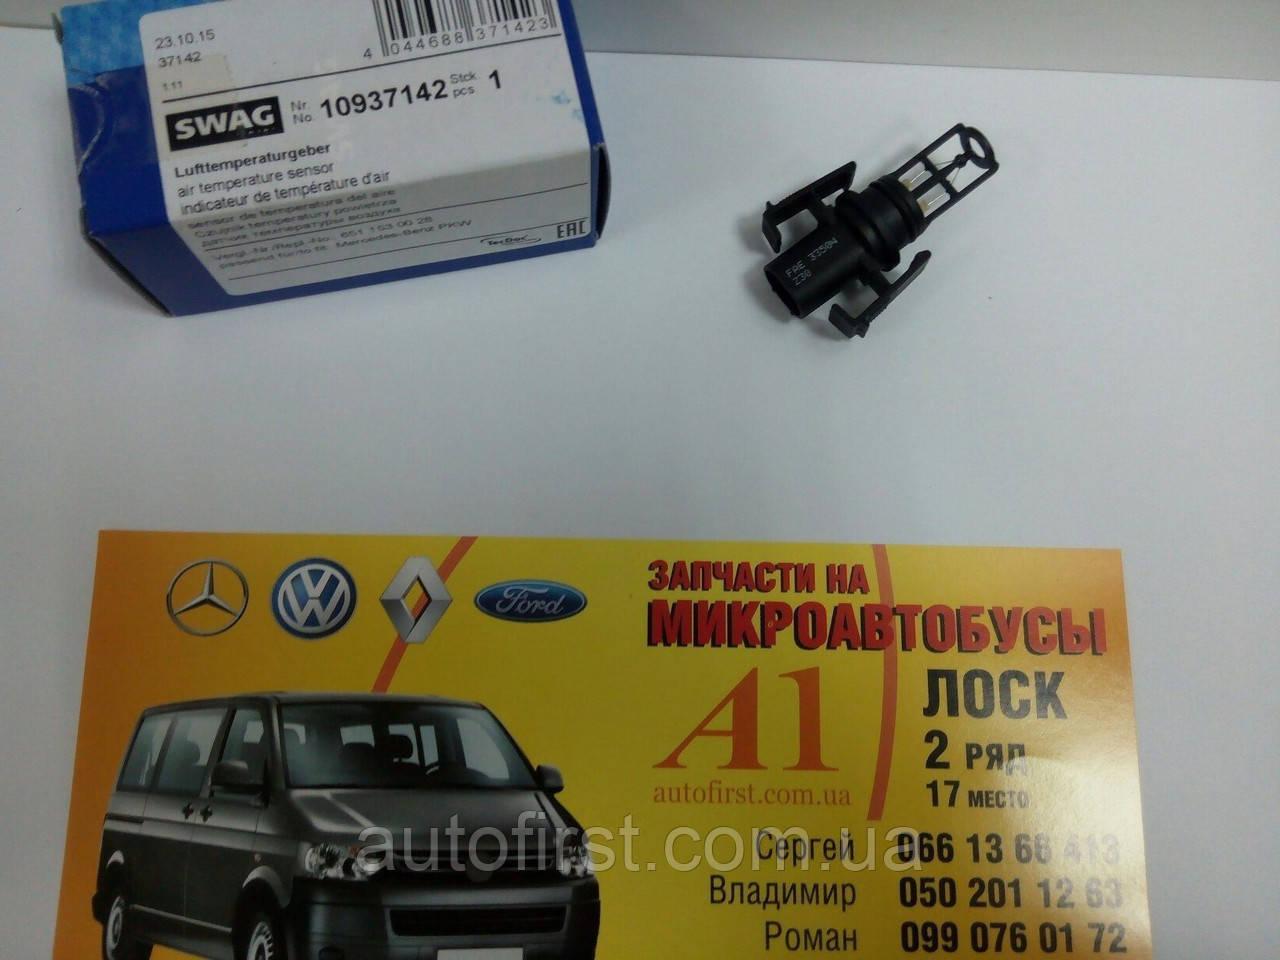 SWAG 10937142 Датчик температуры воздуха Mercedes-Benz Sprinter/Vito 638-639 (Германия)